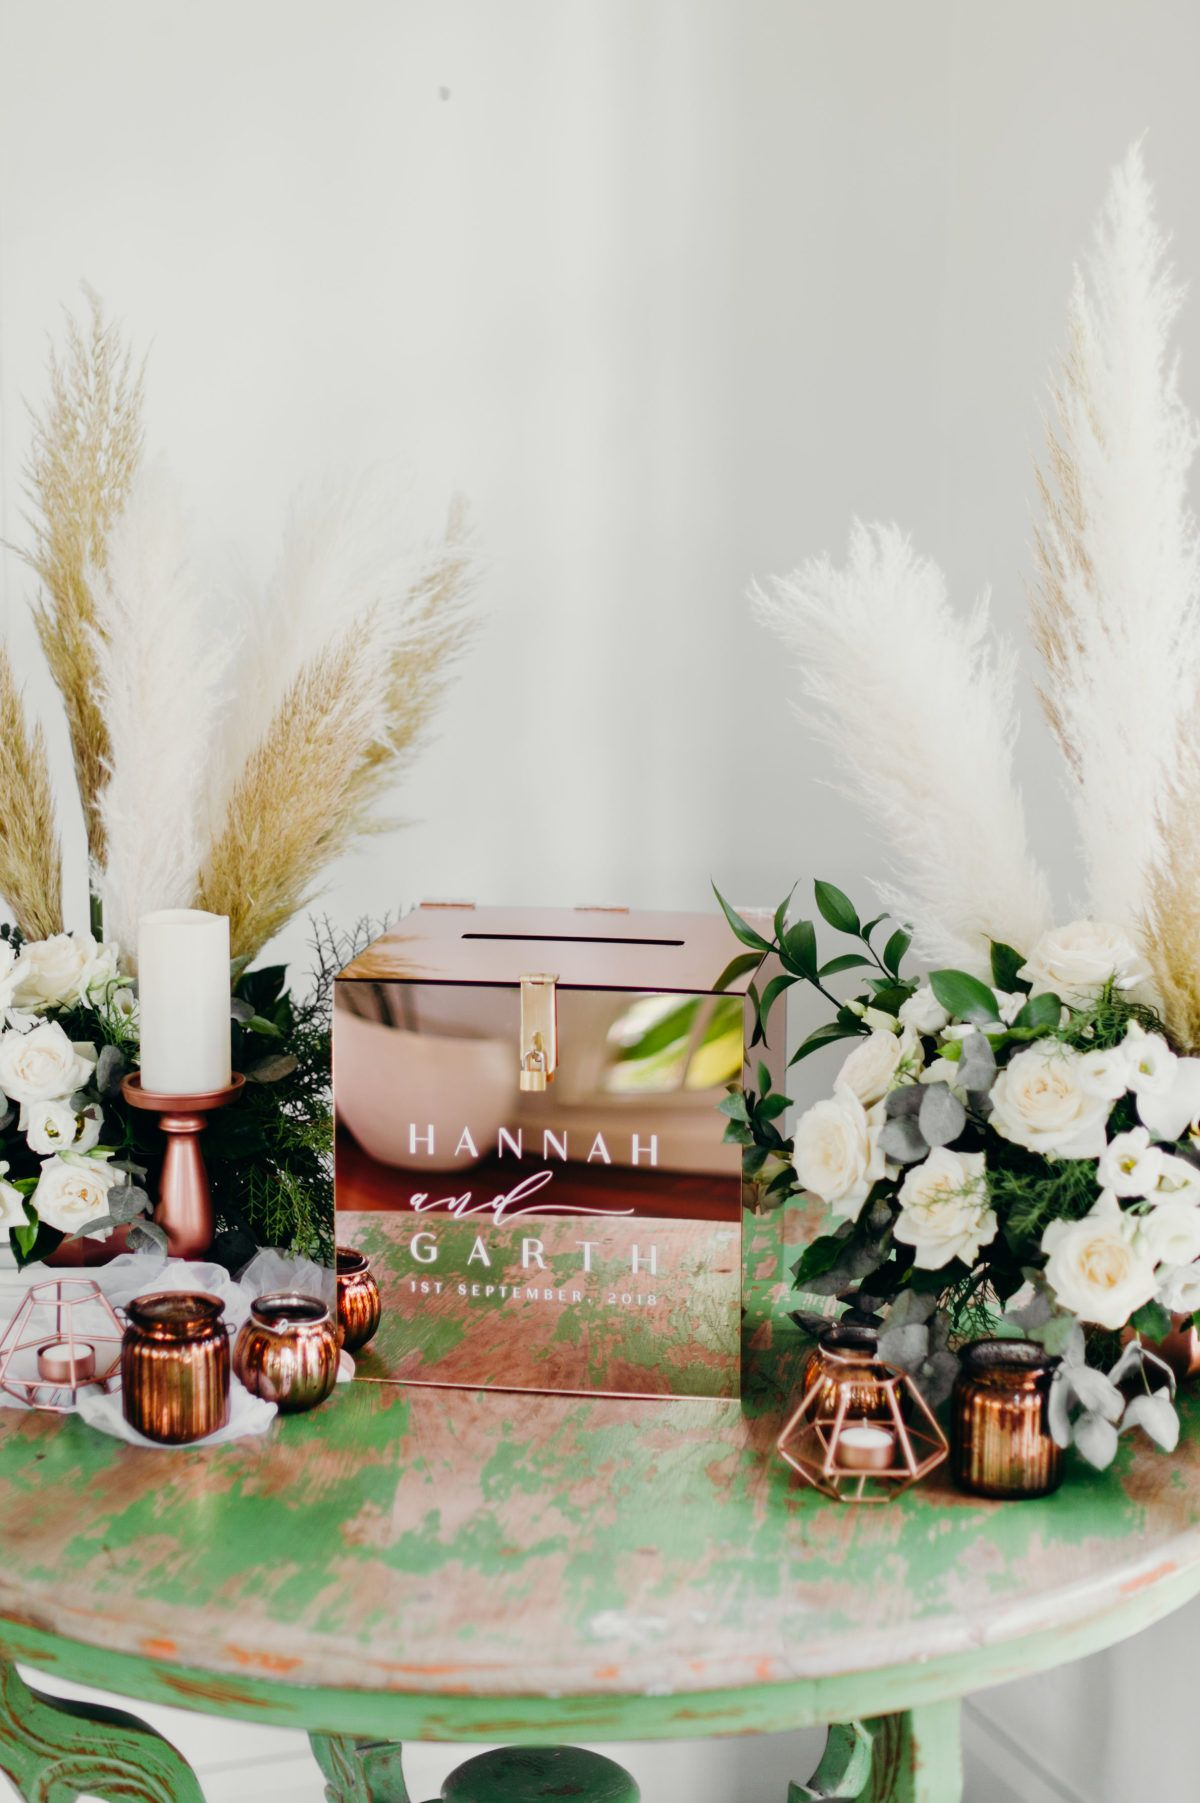 Read More Https Www Stylemepretty Com Vault Image 6839802 In 2020 Wedding Registry Etiquette Wedding Welcome Table Money Box Wedding